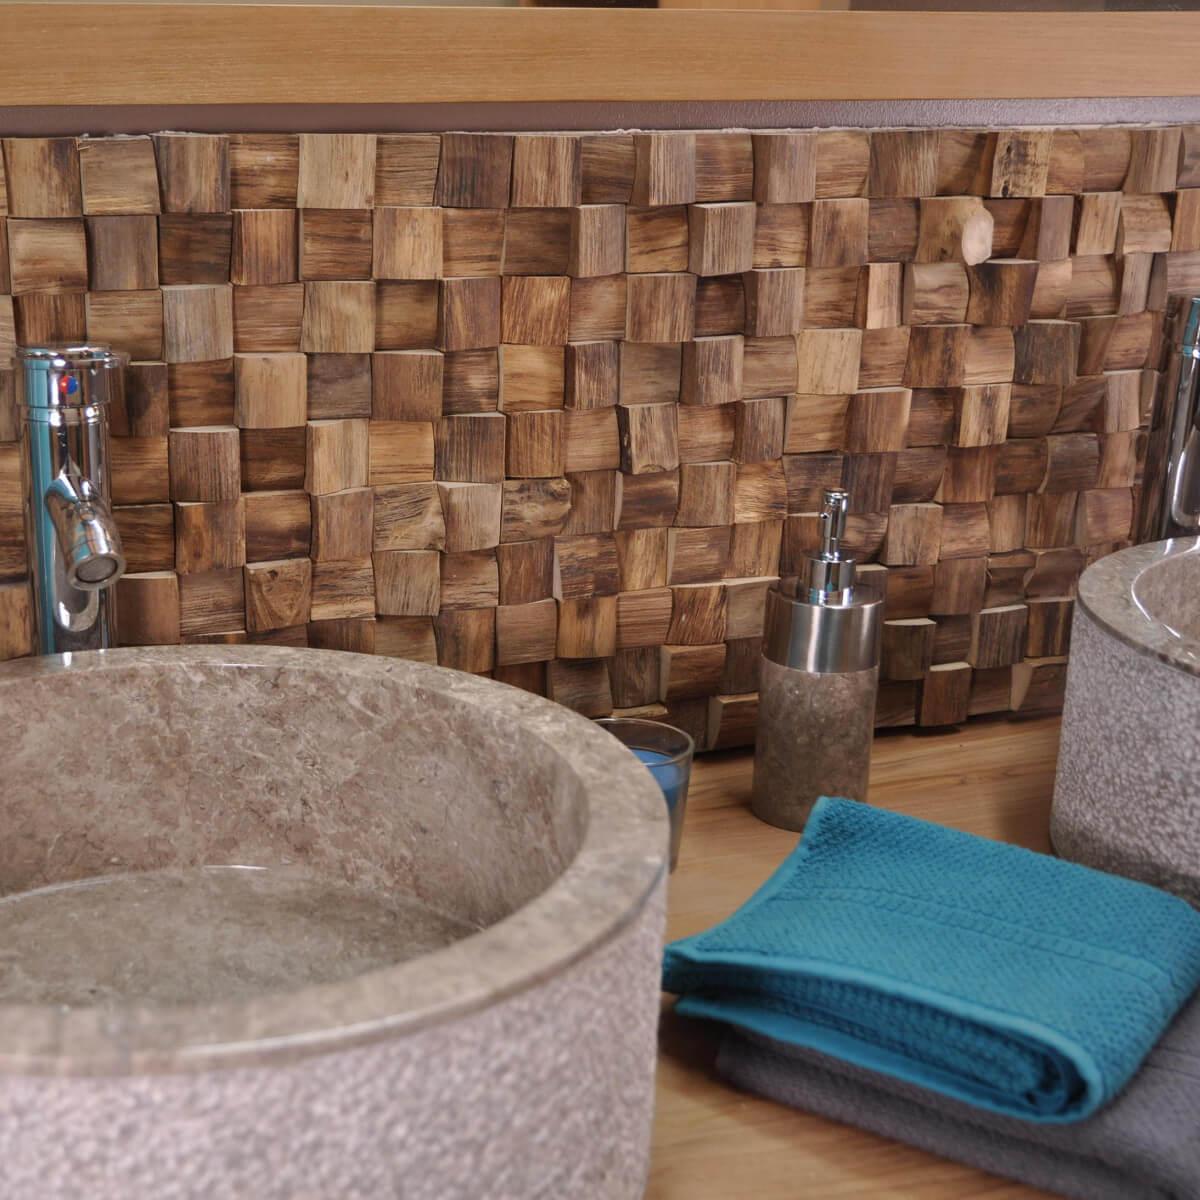 parement mosa que en teck recycl naturel carr 20cm x 50cm. Black Bedroom Furniture Sets. Home Design Ideas